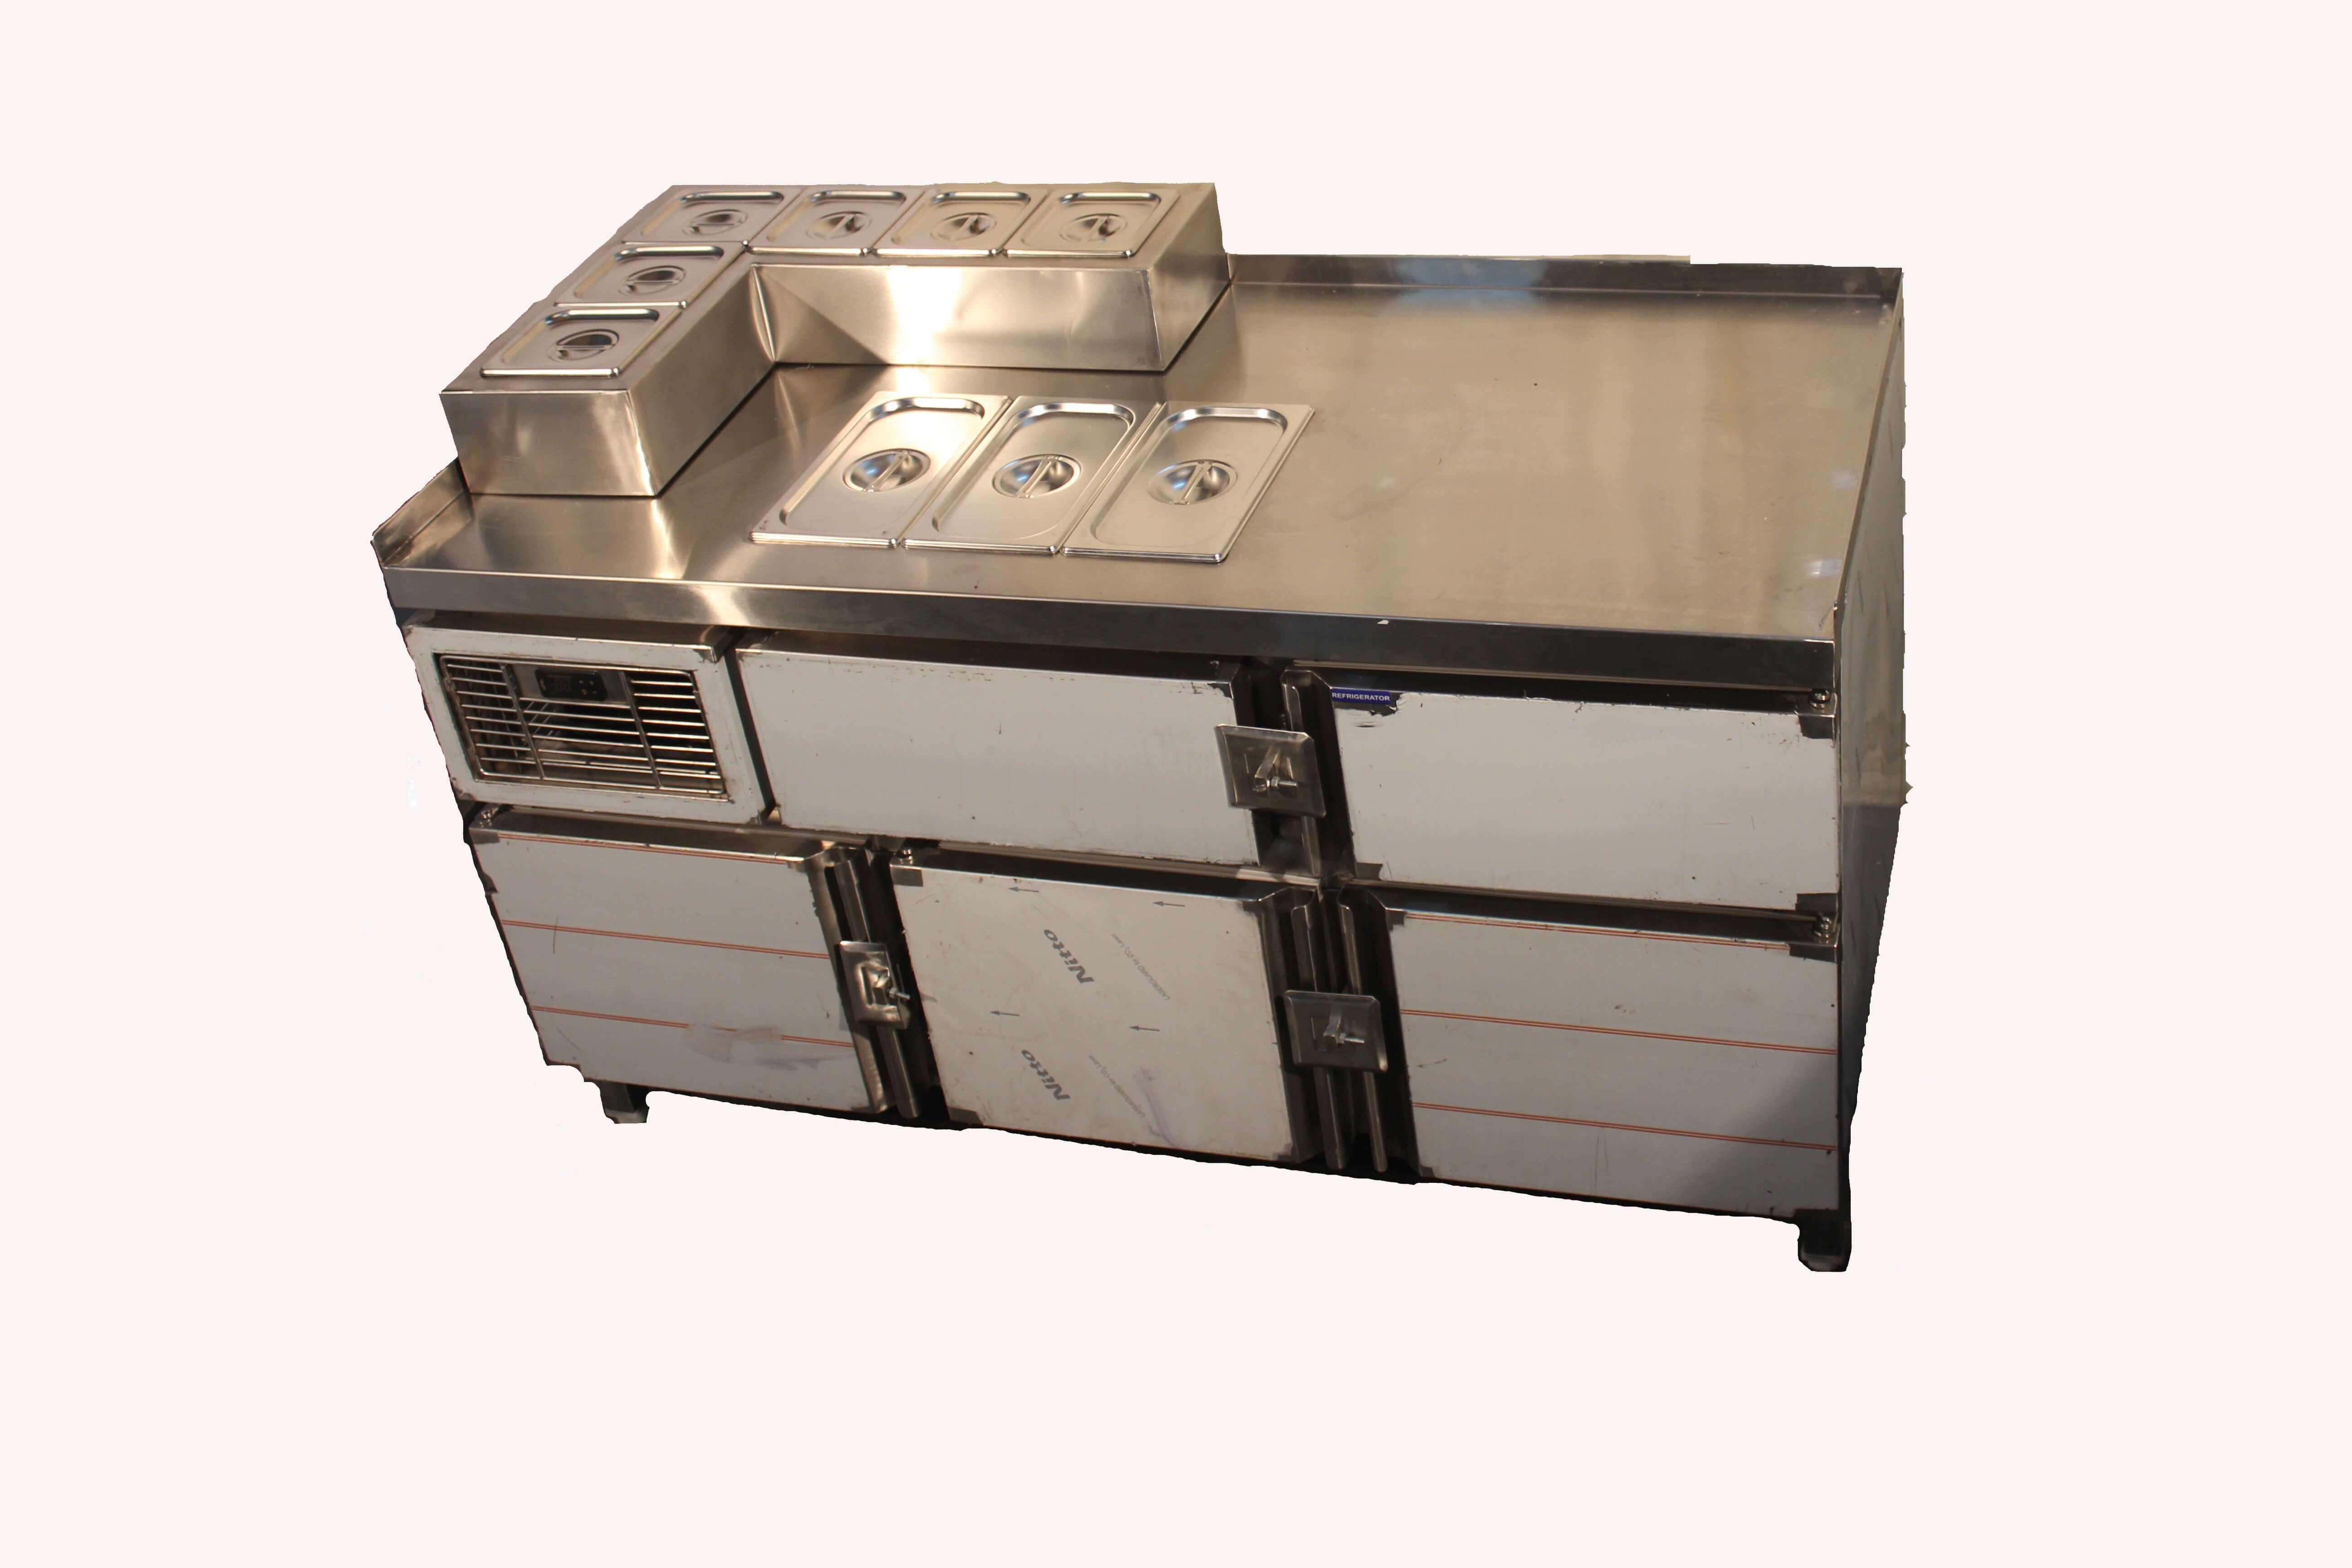 Table Top Refrigerators